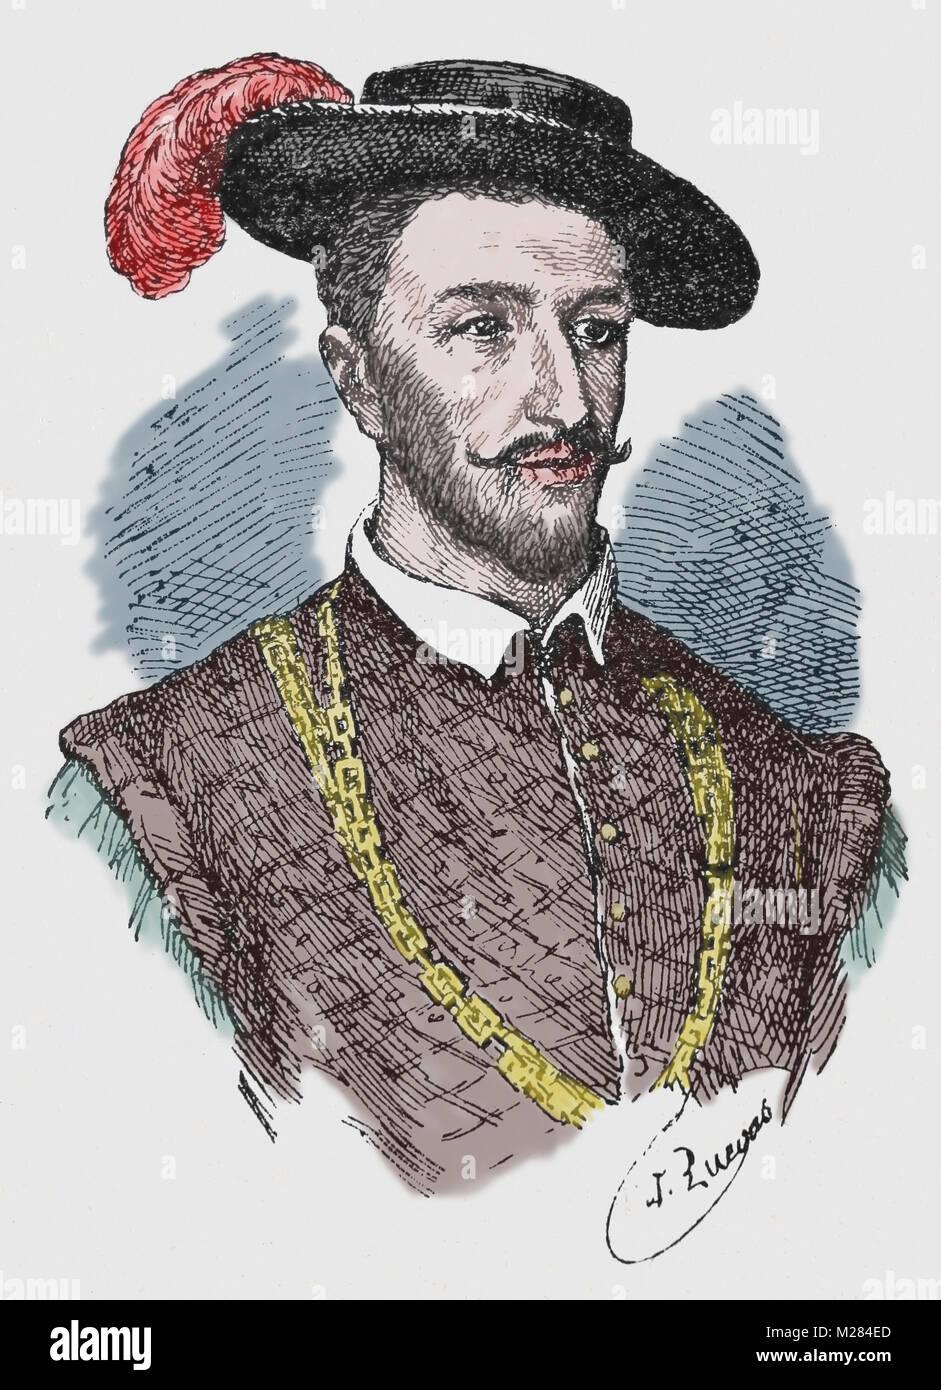 Juan de Grijalva (1489-1527). Spanish conquistador. Engraving, portrait. - Stock Image